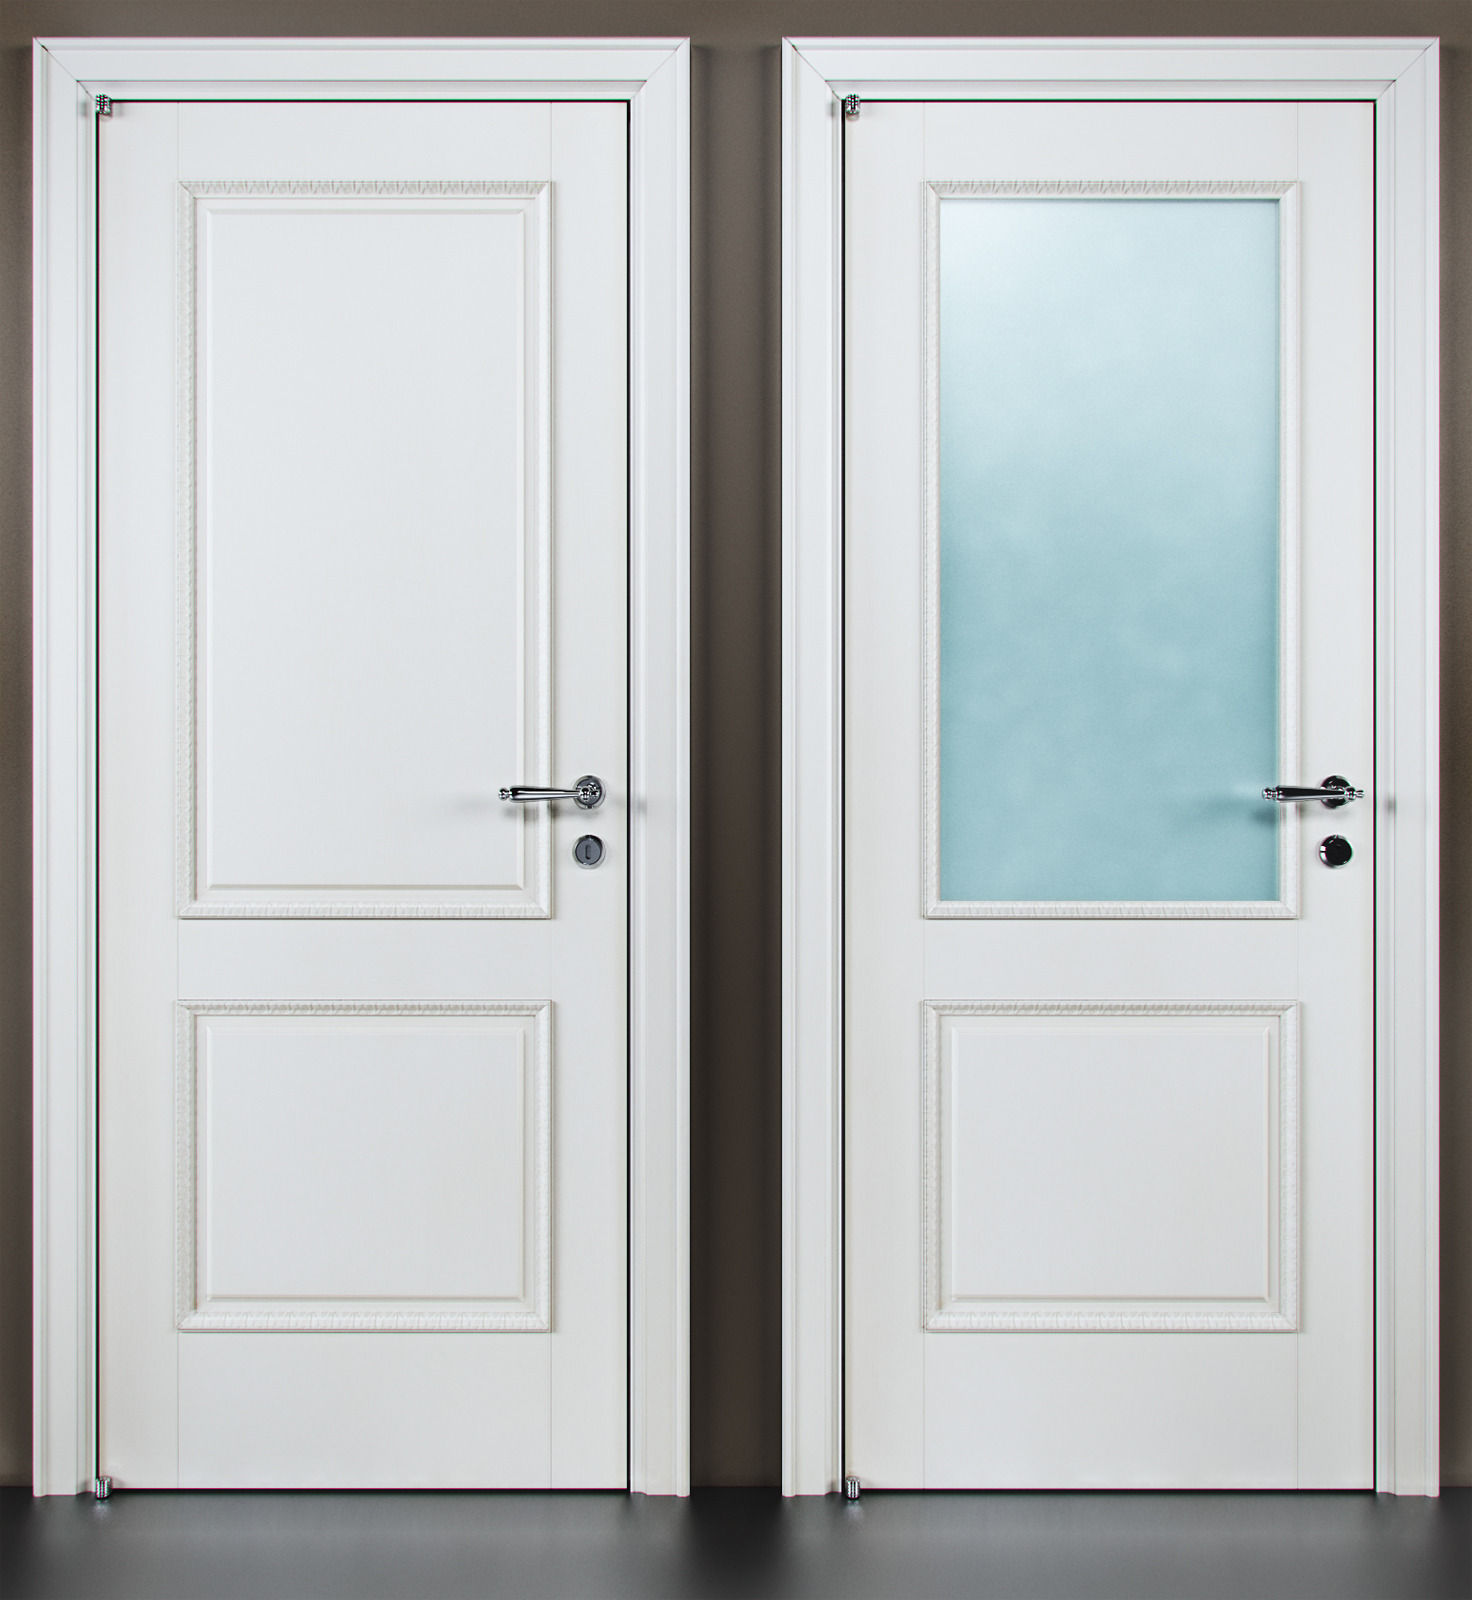 Door barausse 12 3d model max fbx for Door 3d model